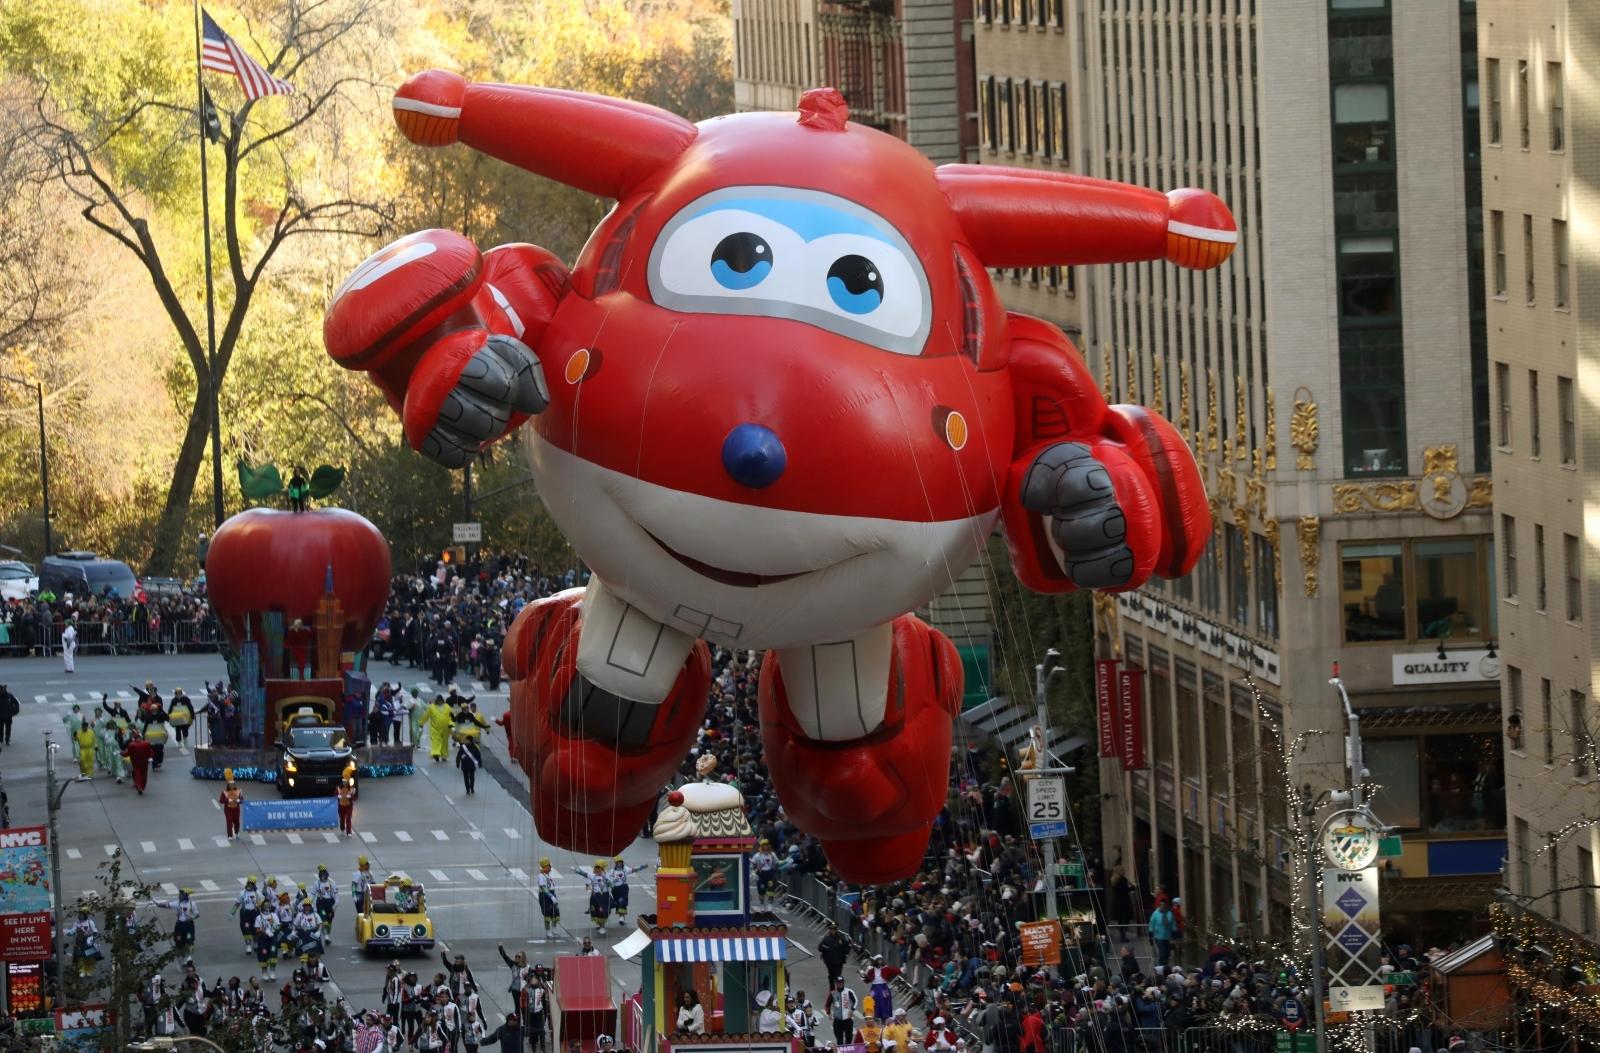 Macys Thanksgiving Parade balloons 2017